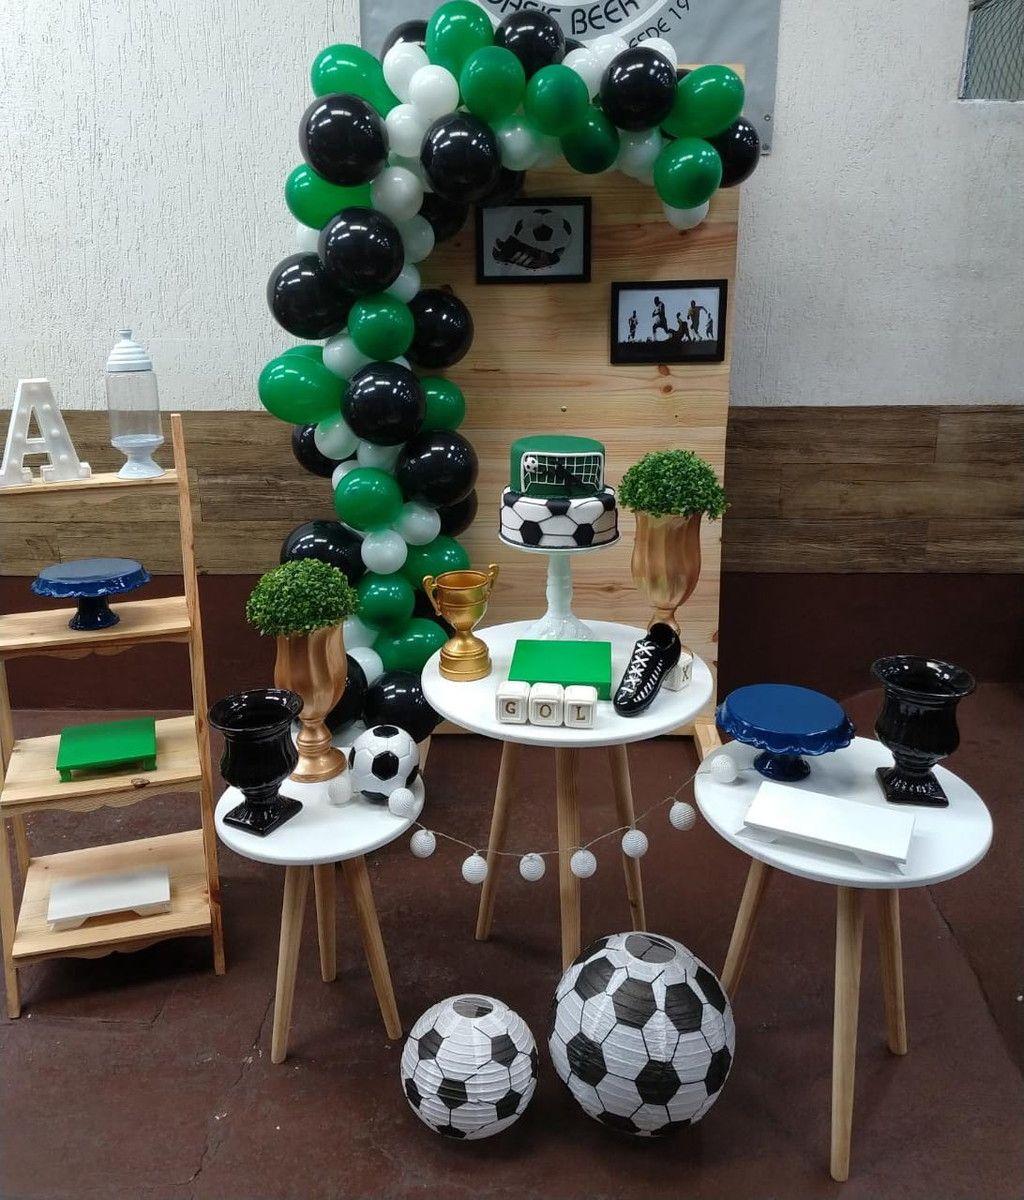 Decoracao De Festa Mini Table Futebol Locacao No Elo7 Lily